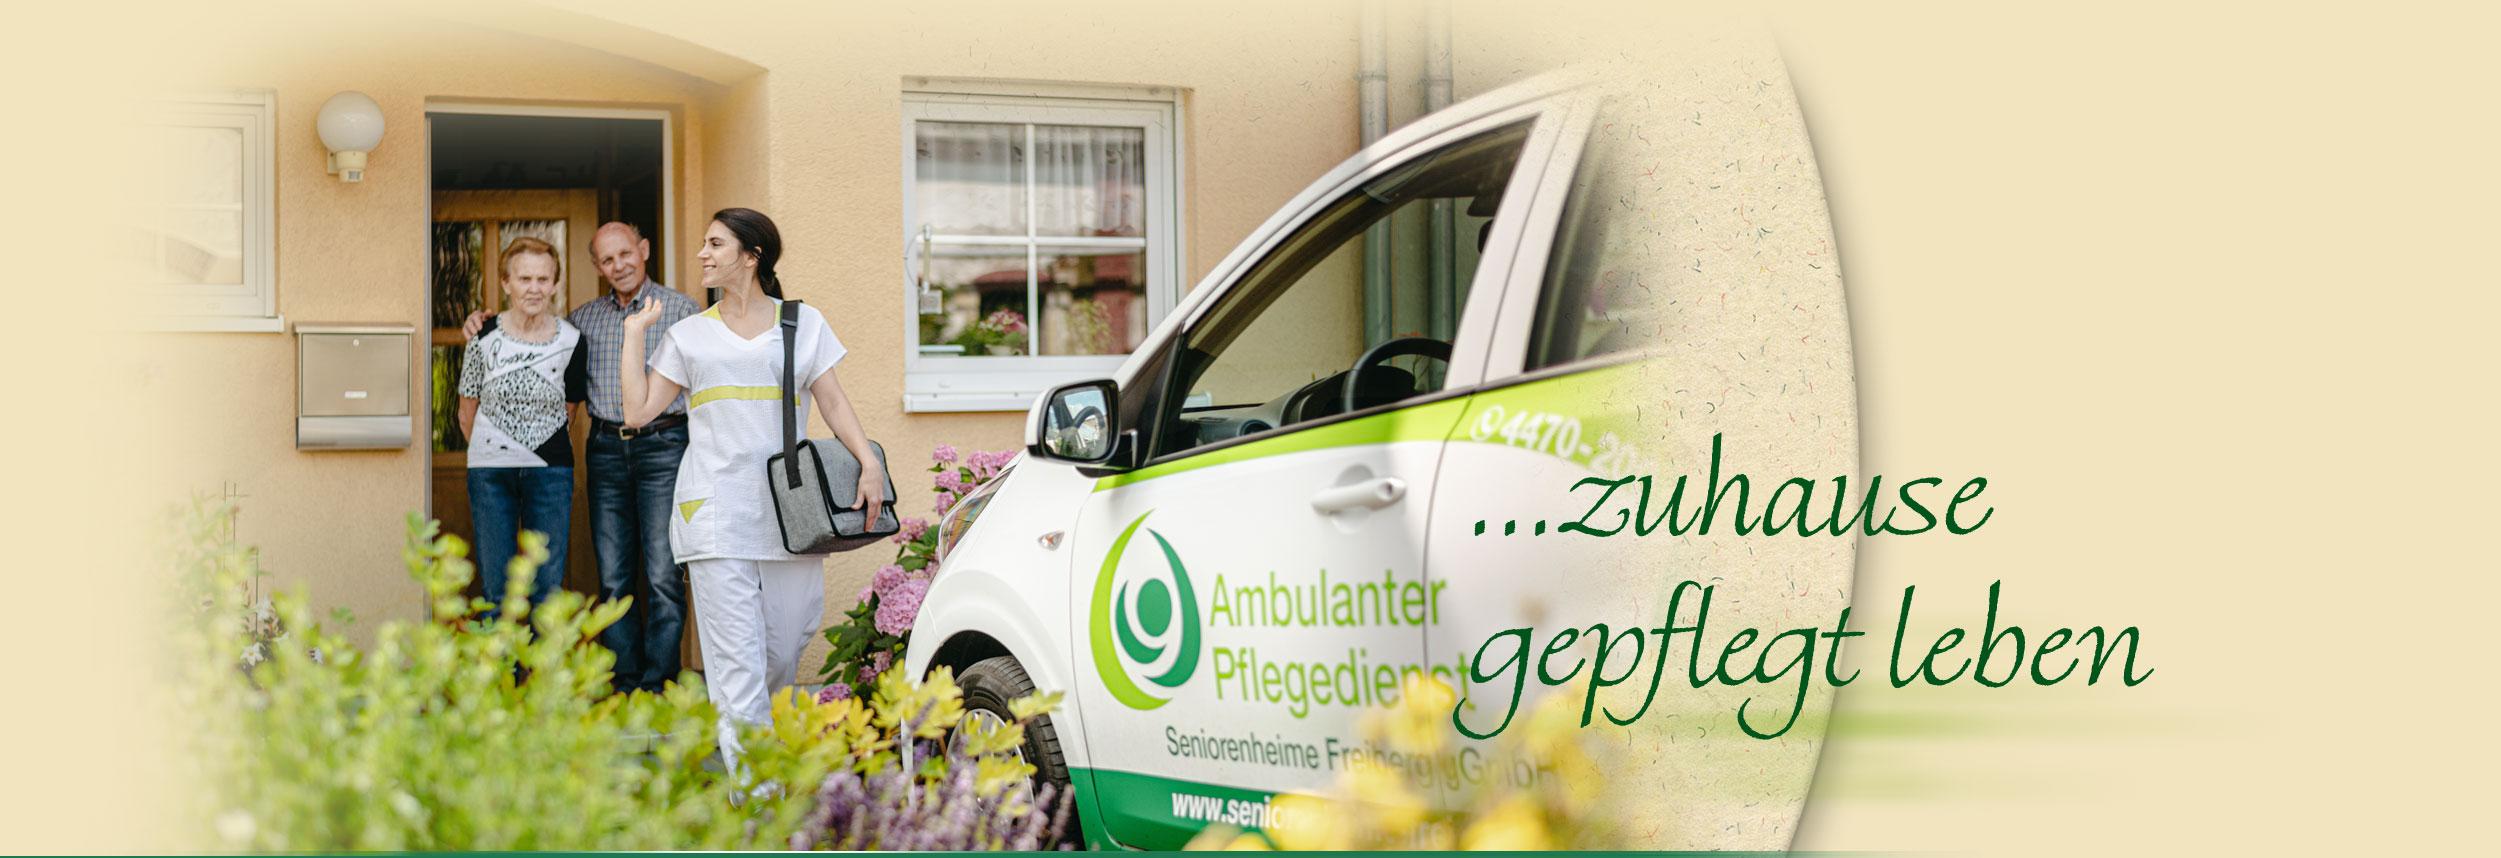 Ambulanter Pflegedienst - Seniorenheime Freiberg gGmbH